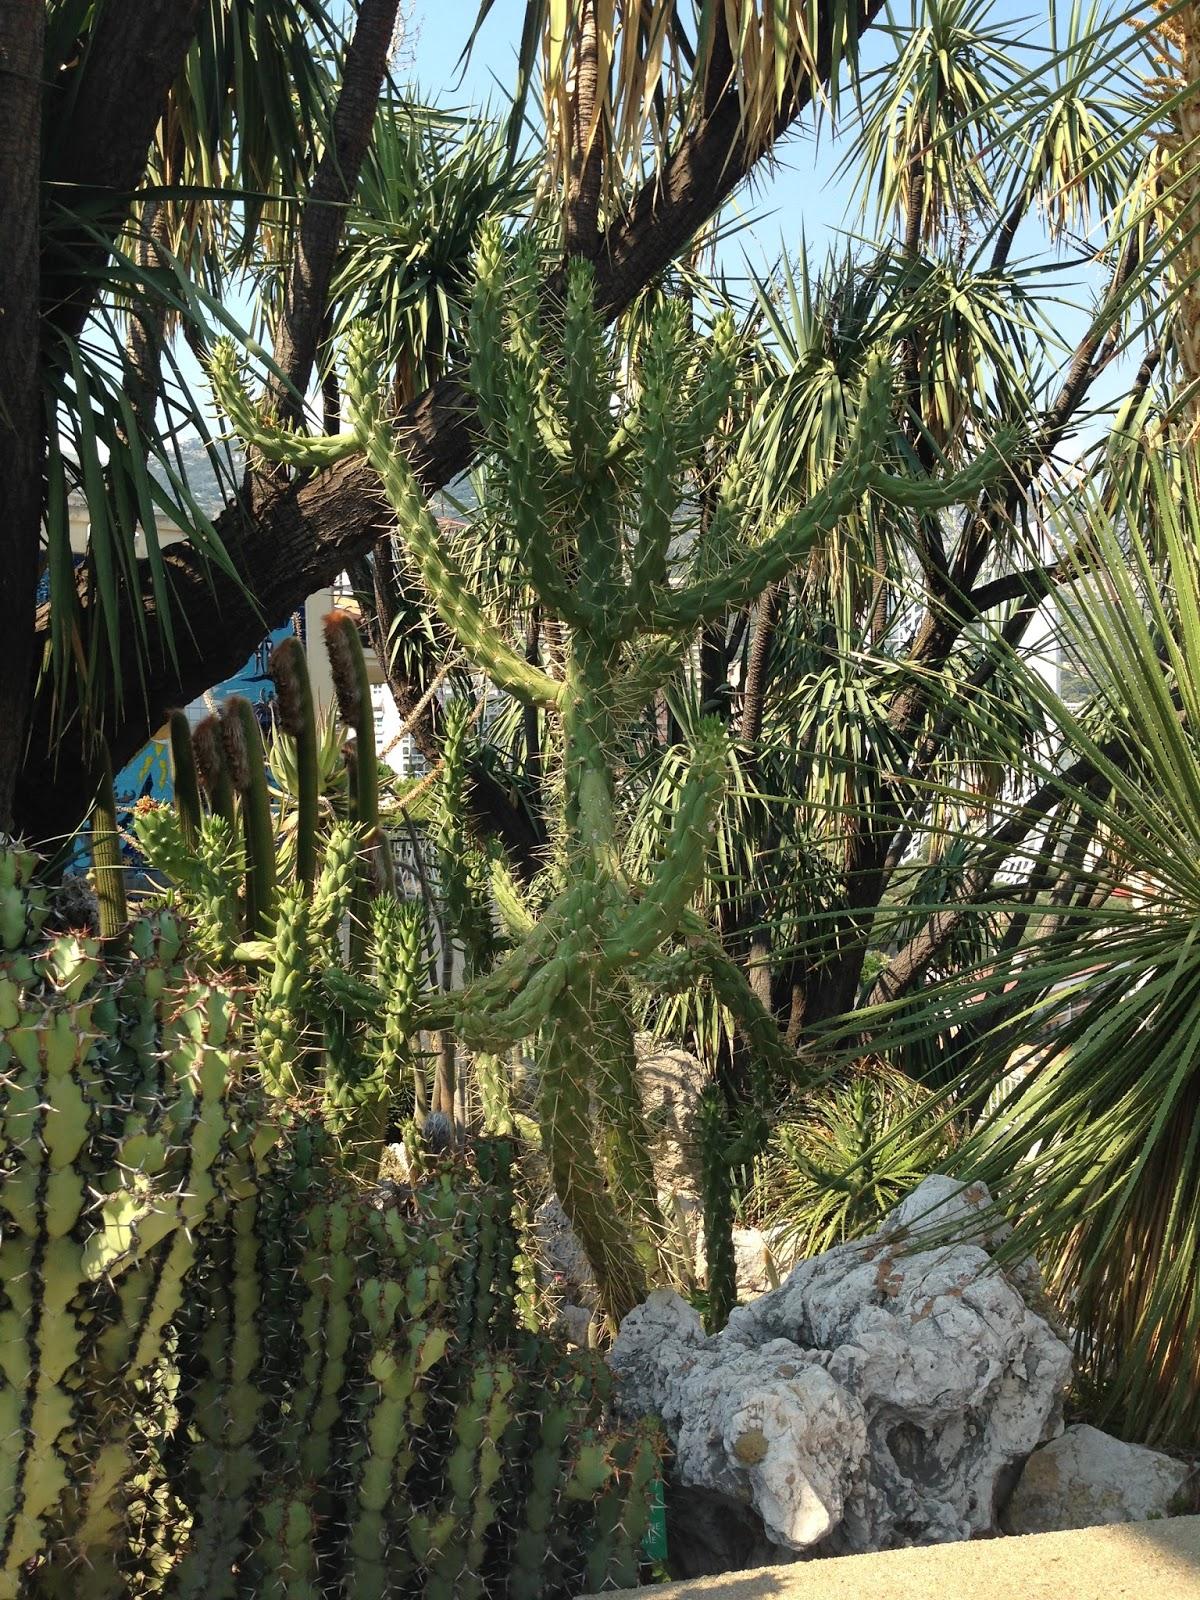 Succulent sundae jardin exotique monaco part 7 for Jardin exotique